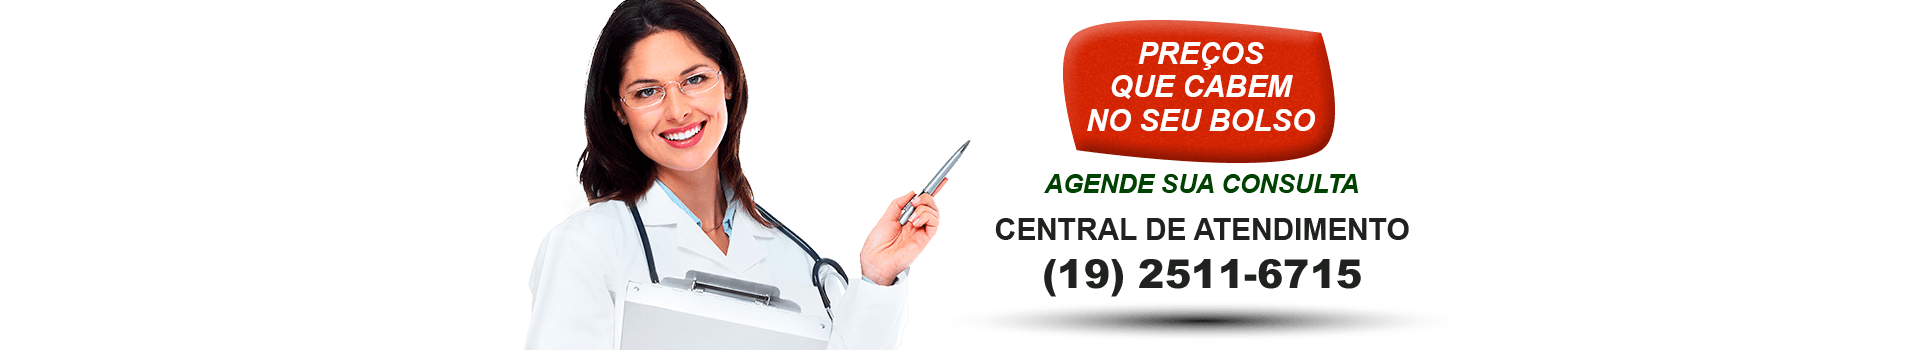 clinica-popular-soma-banner-central-atendimento